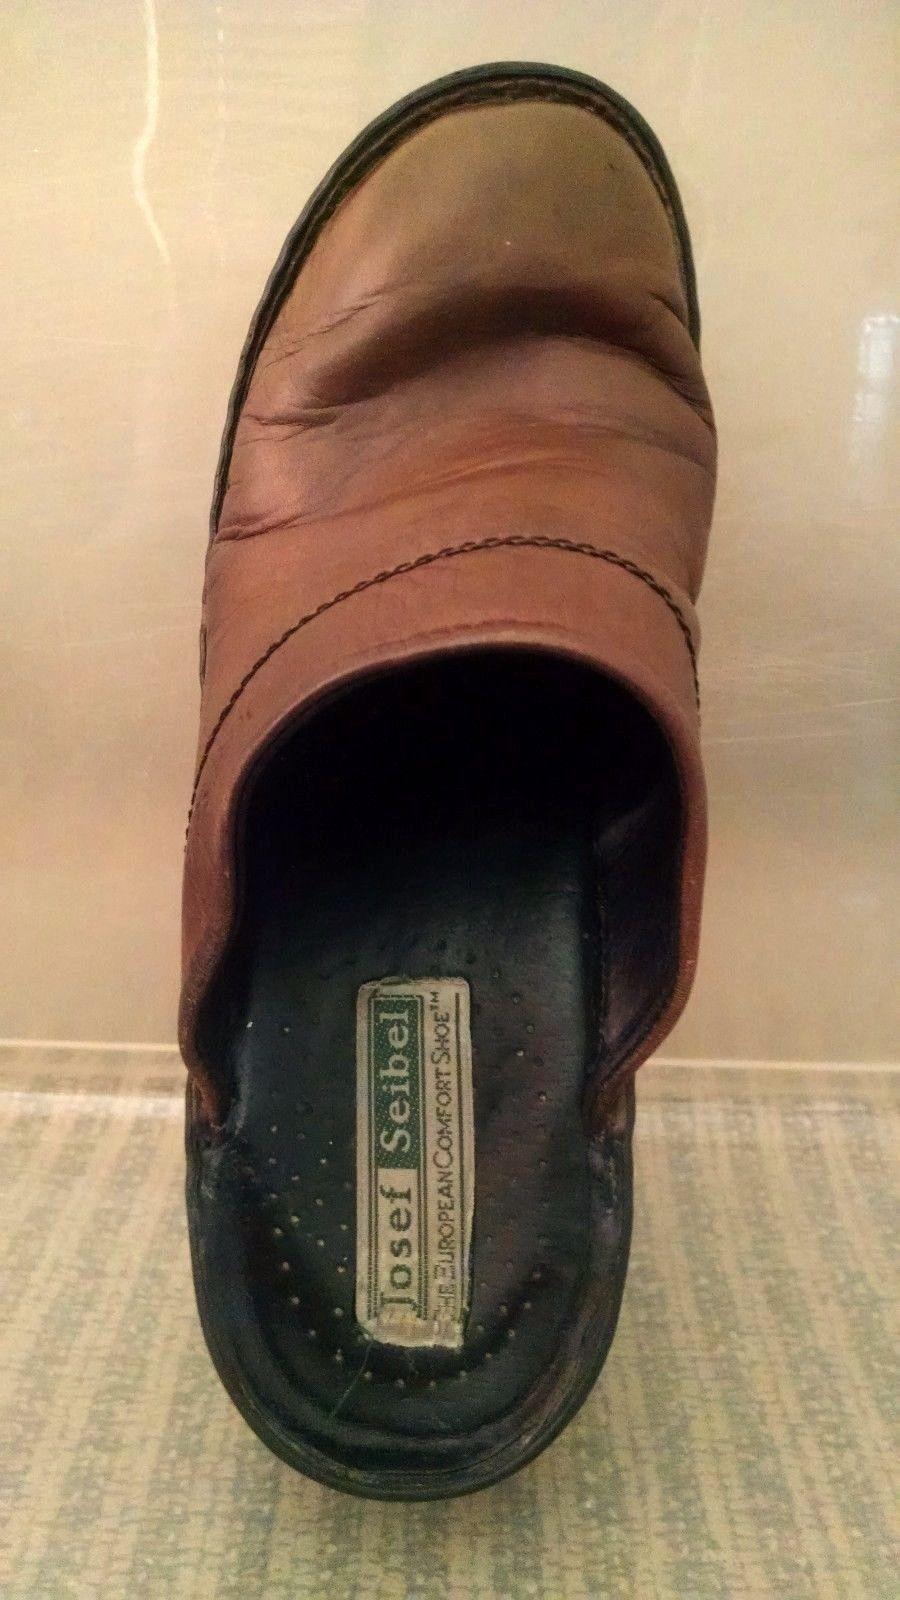 Josef Seibel Womens Clogs 38 EU 7 - 7.5 US Mules Slip On European Comfort Shoe image 6